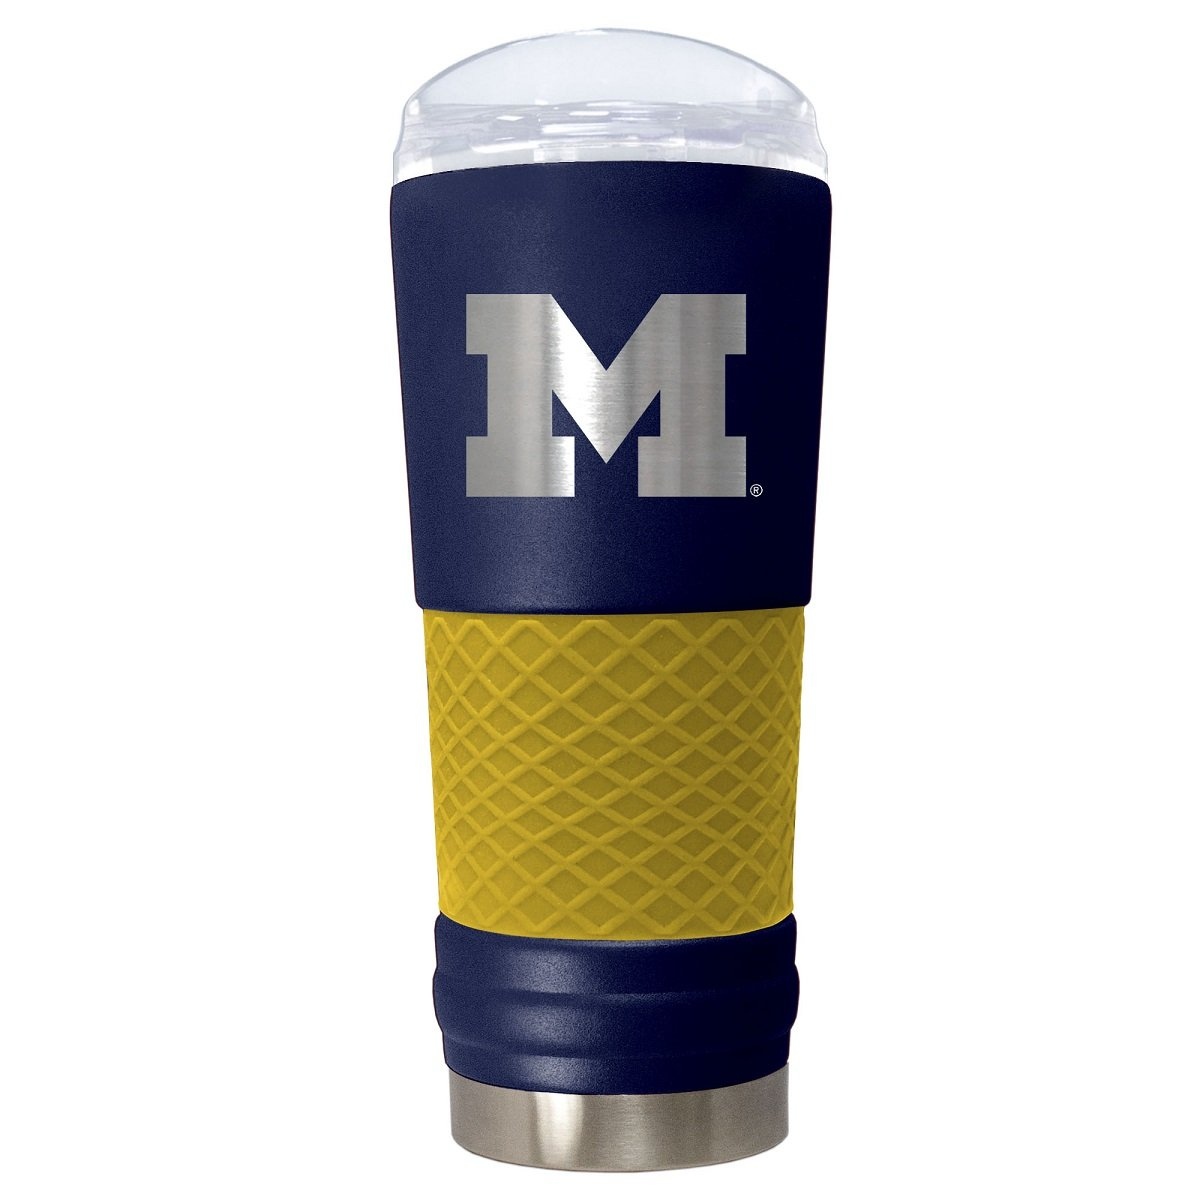 2018 Michigan Wolverines Football Schedule Pint Glass